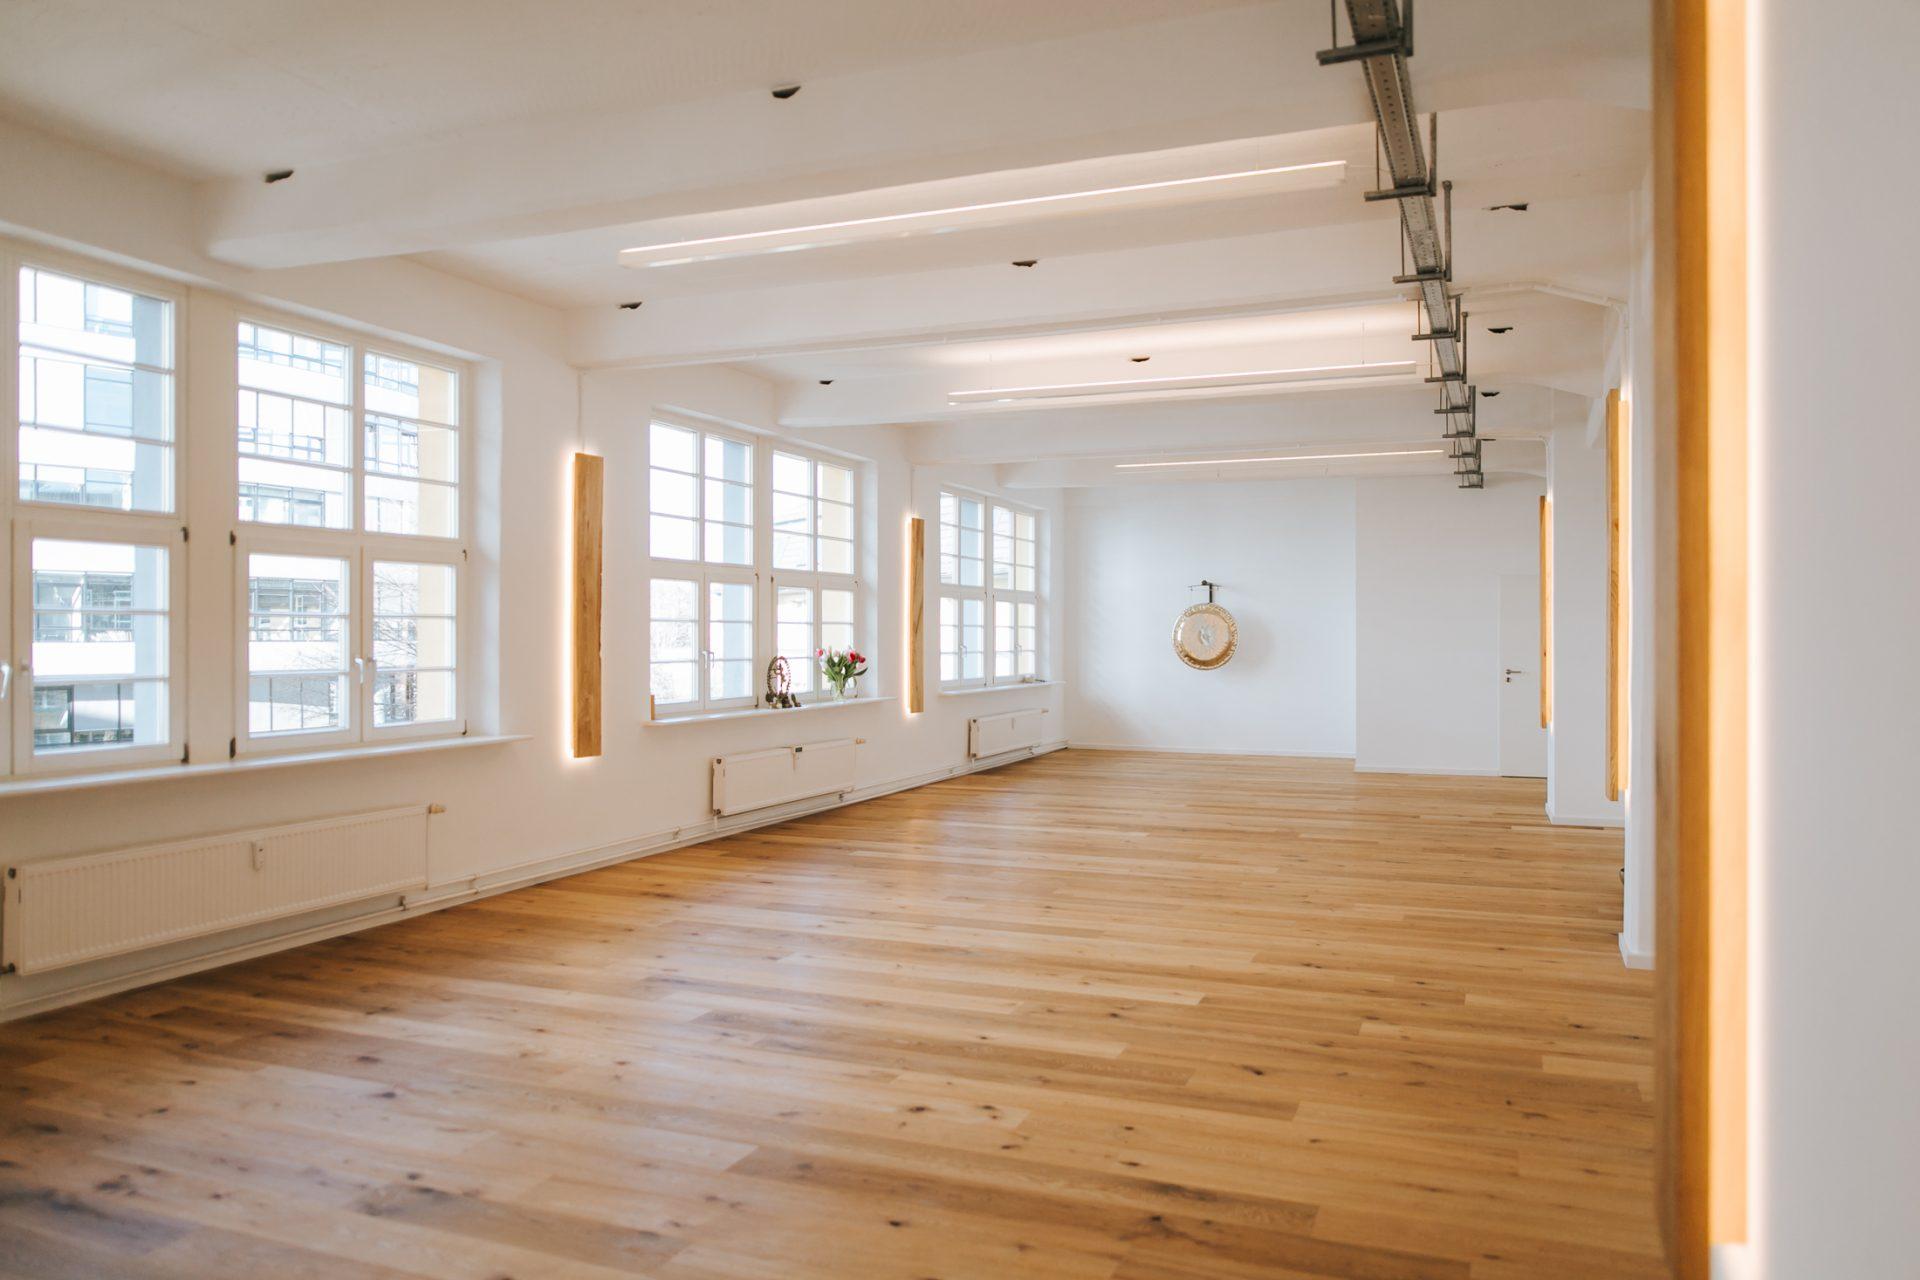 Yoga Studio In Stuttgart Mieten Fur Kurse Workshops Und Seminare